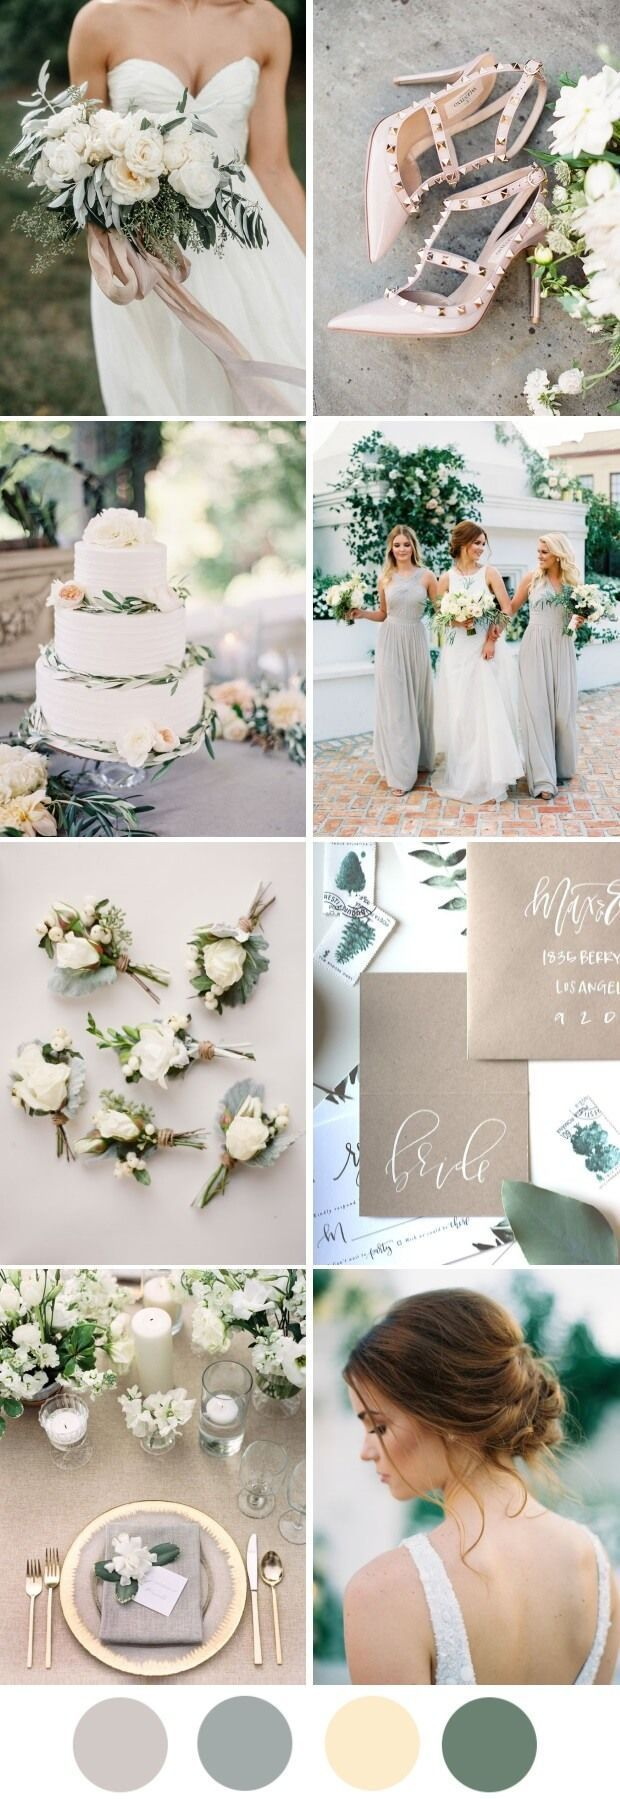 A Romantic, Neutral Palette for Minimalist Weddings • Mrs2Be #weddingfall